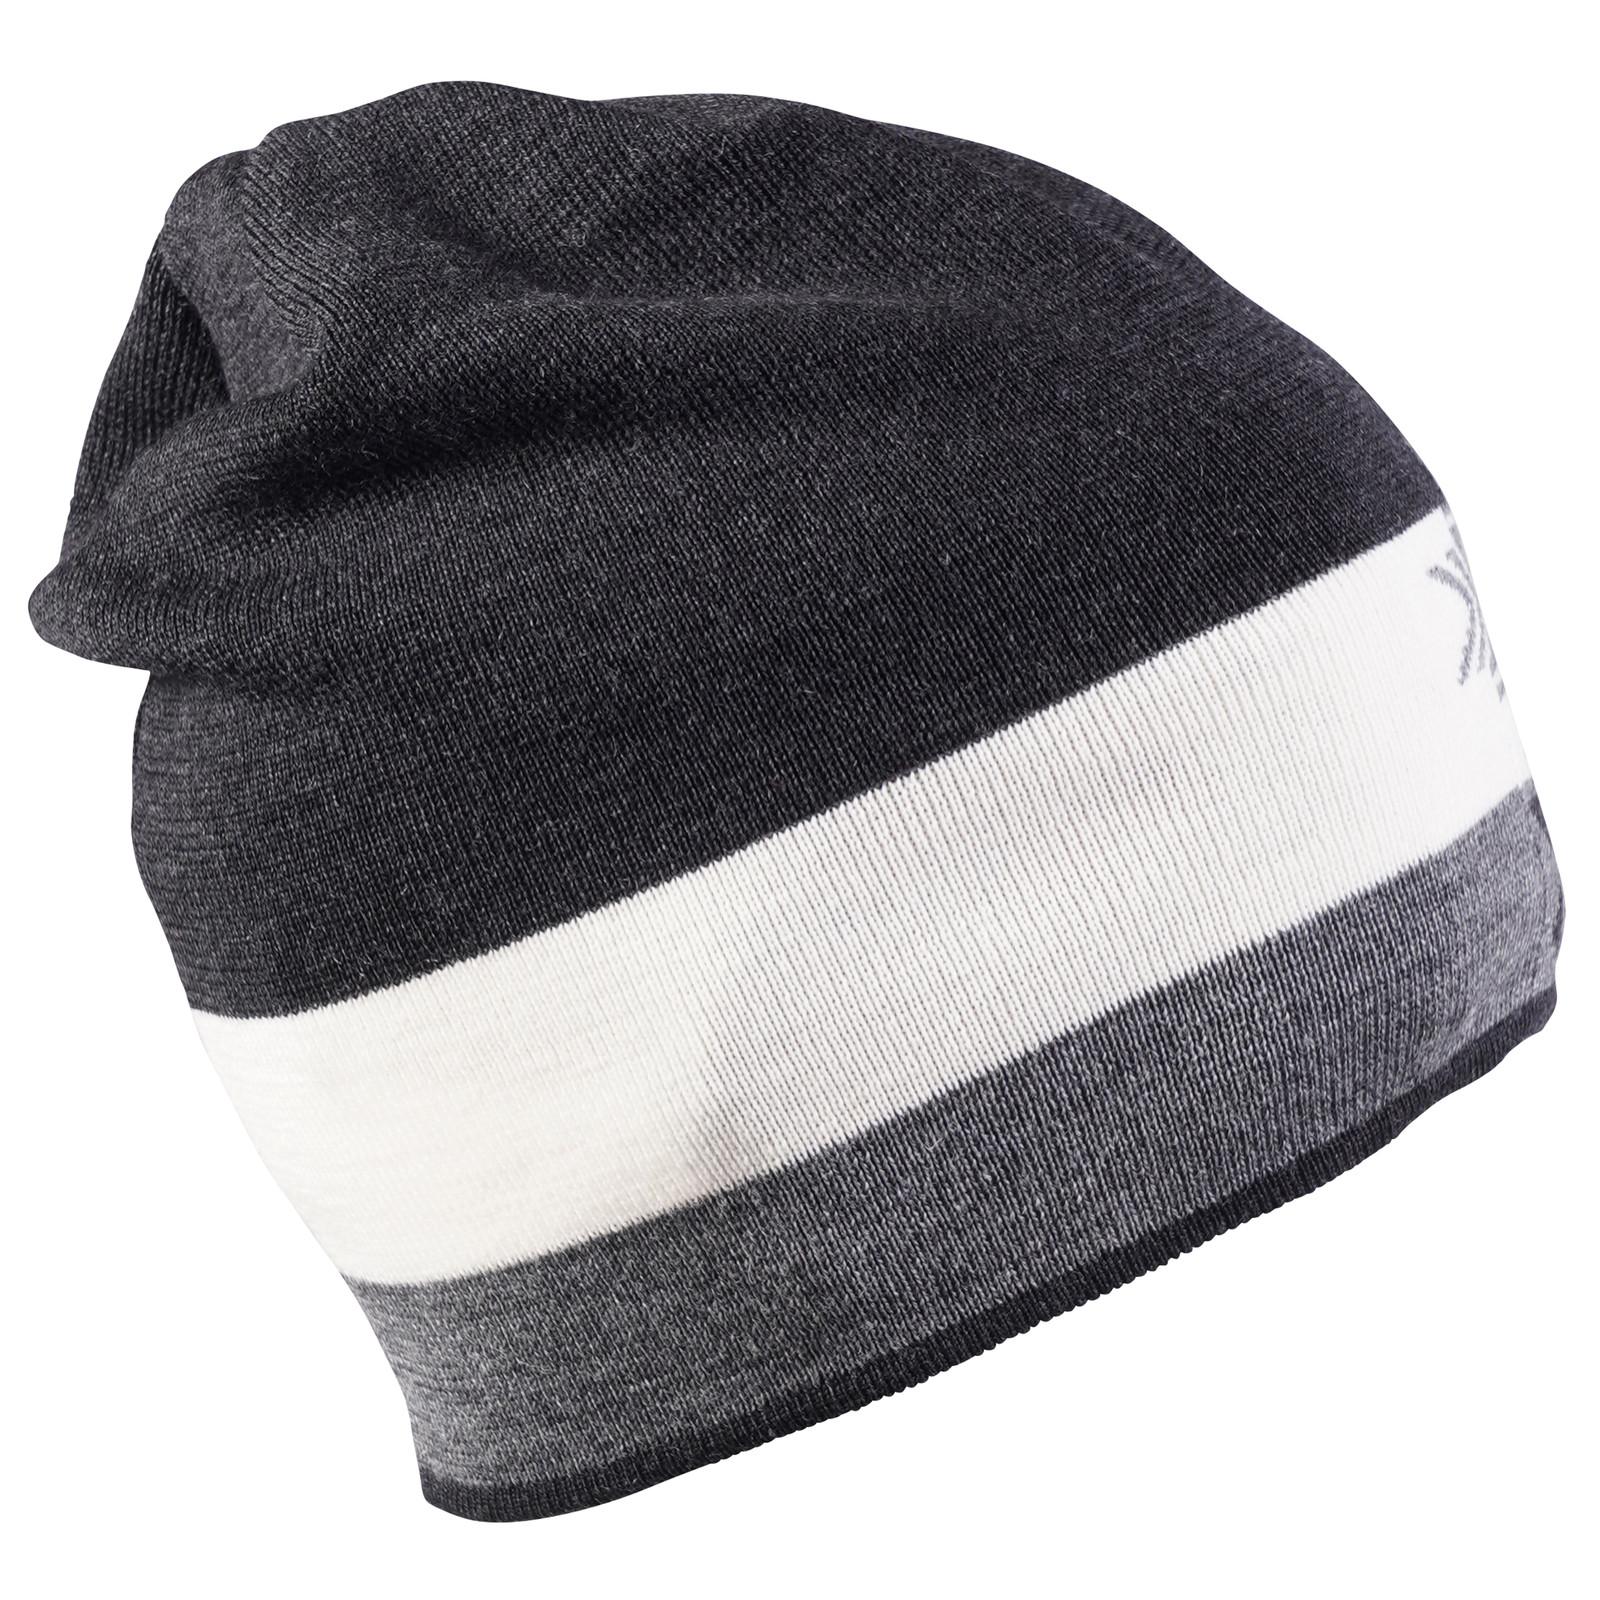 Dale of Norway Geilolia Hat - Dark Charcoal/Smoke/Off White, 48261-E